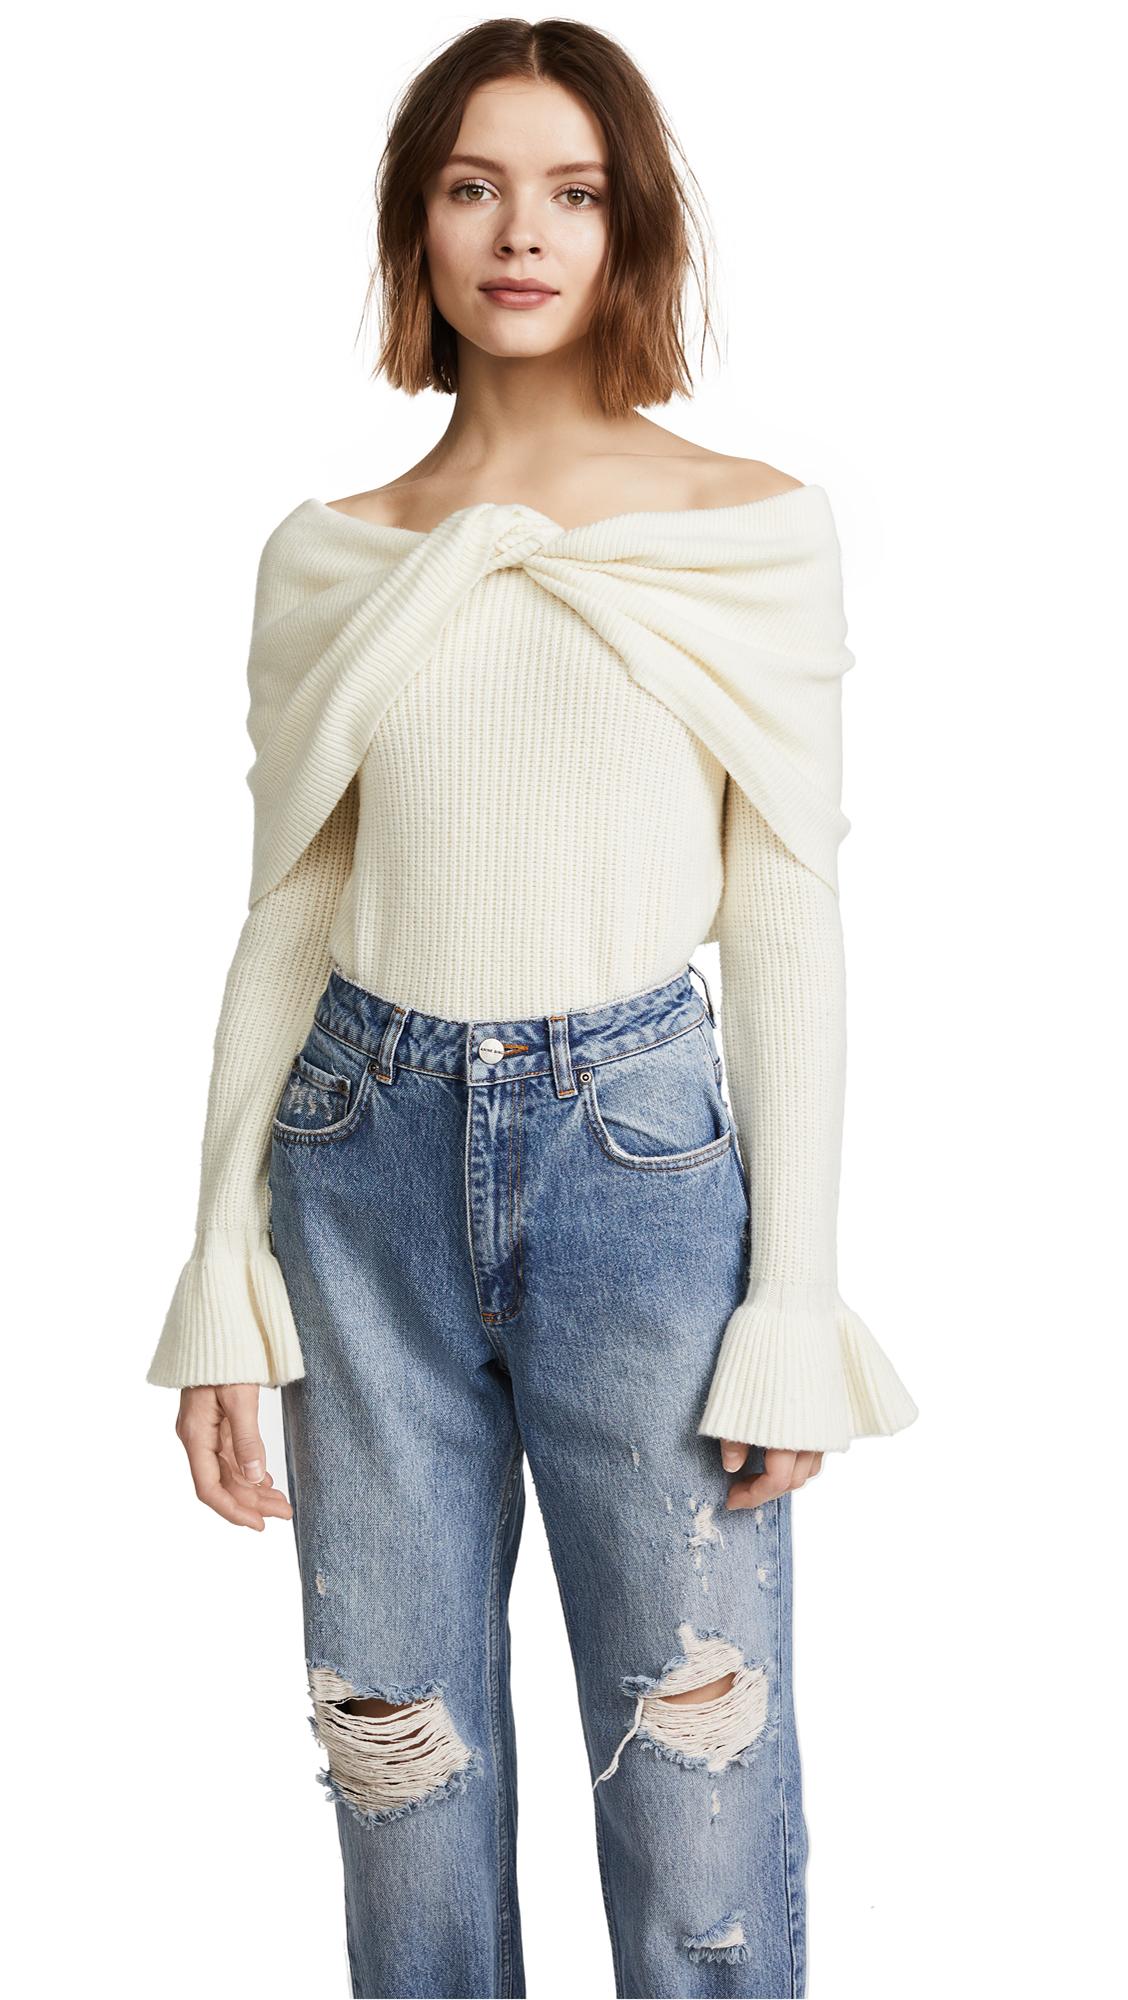 Ella Moss Jasinda Sweater - Natural